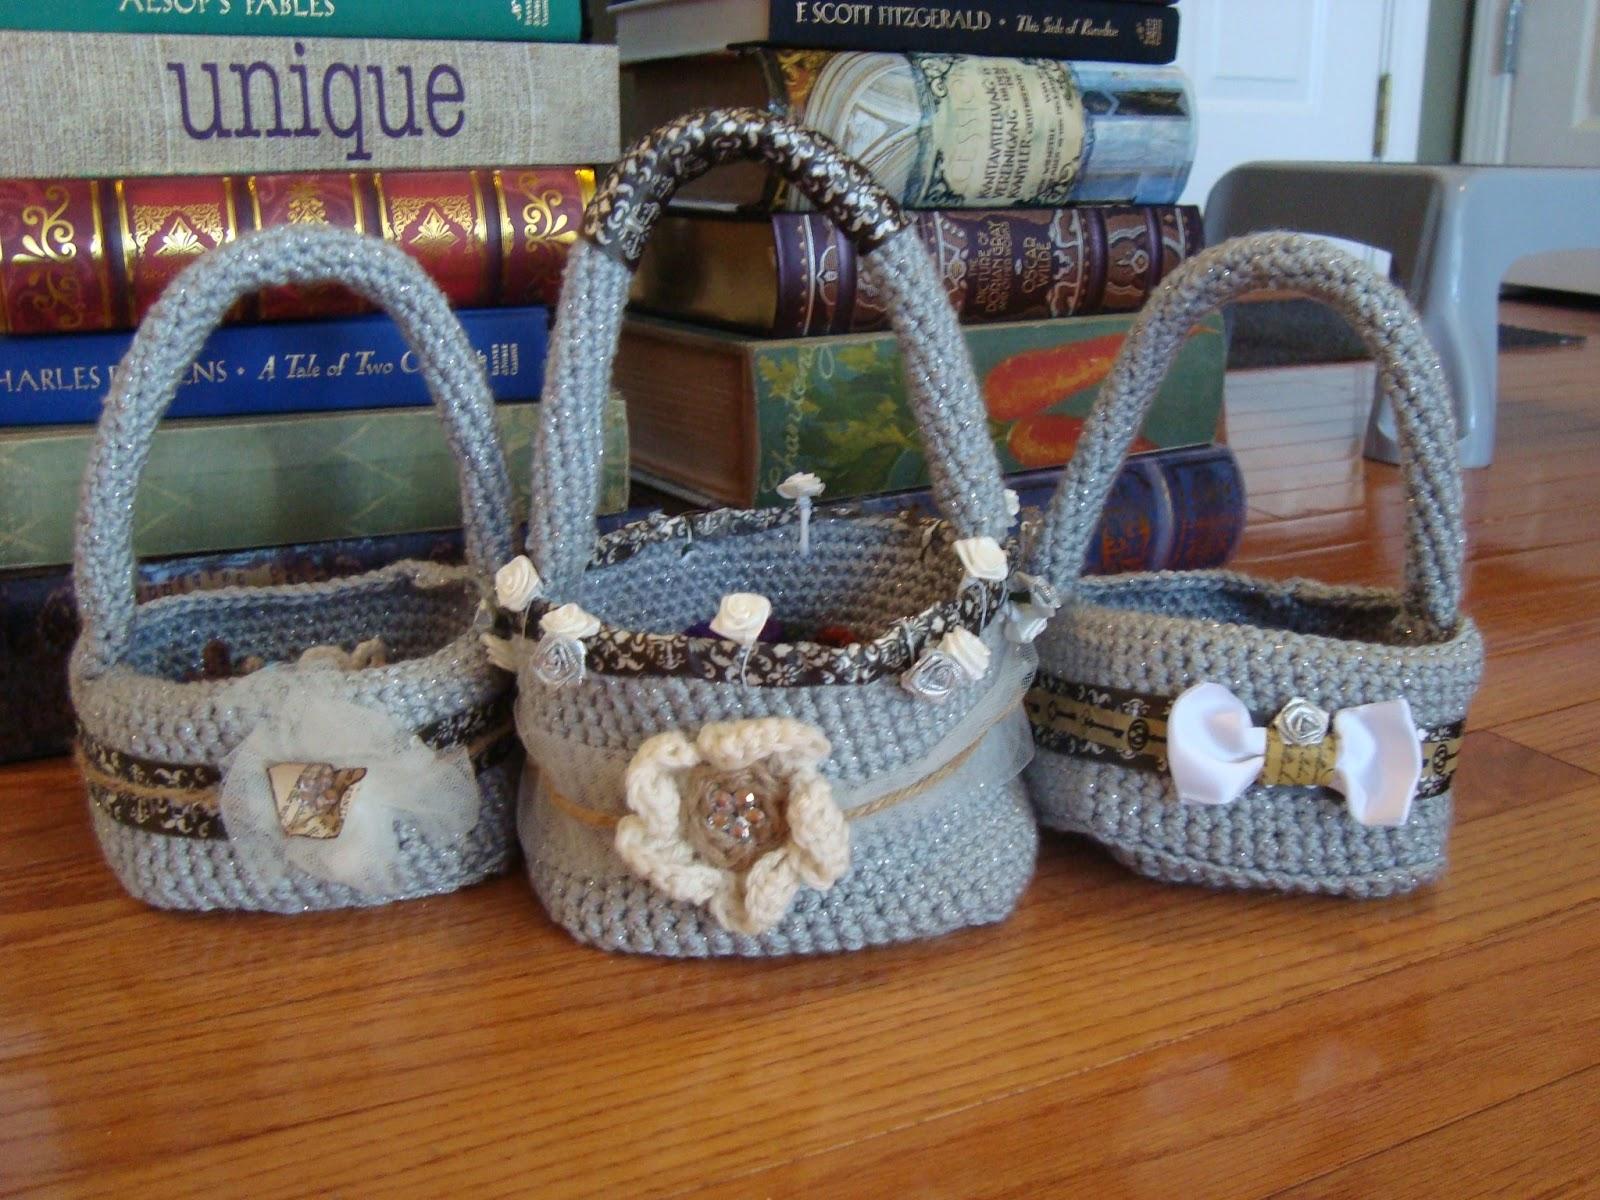 Crochet Flower Girl Basket Pattern : Diy literary wedding crocheted flowers and flower girl